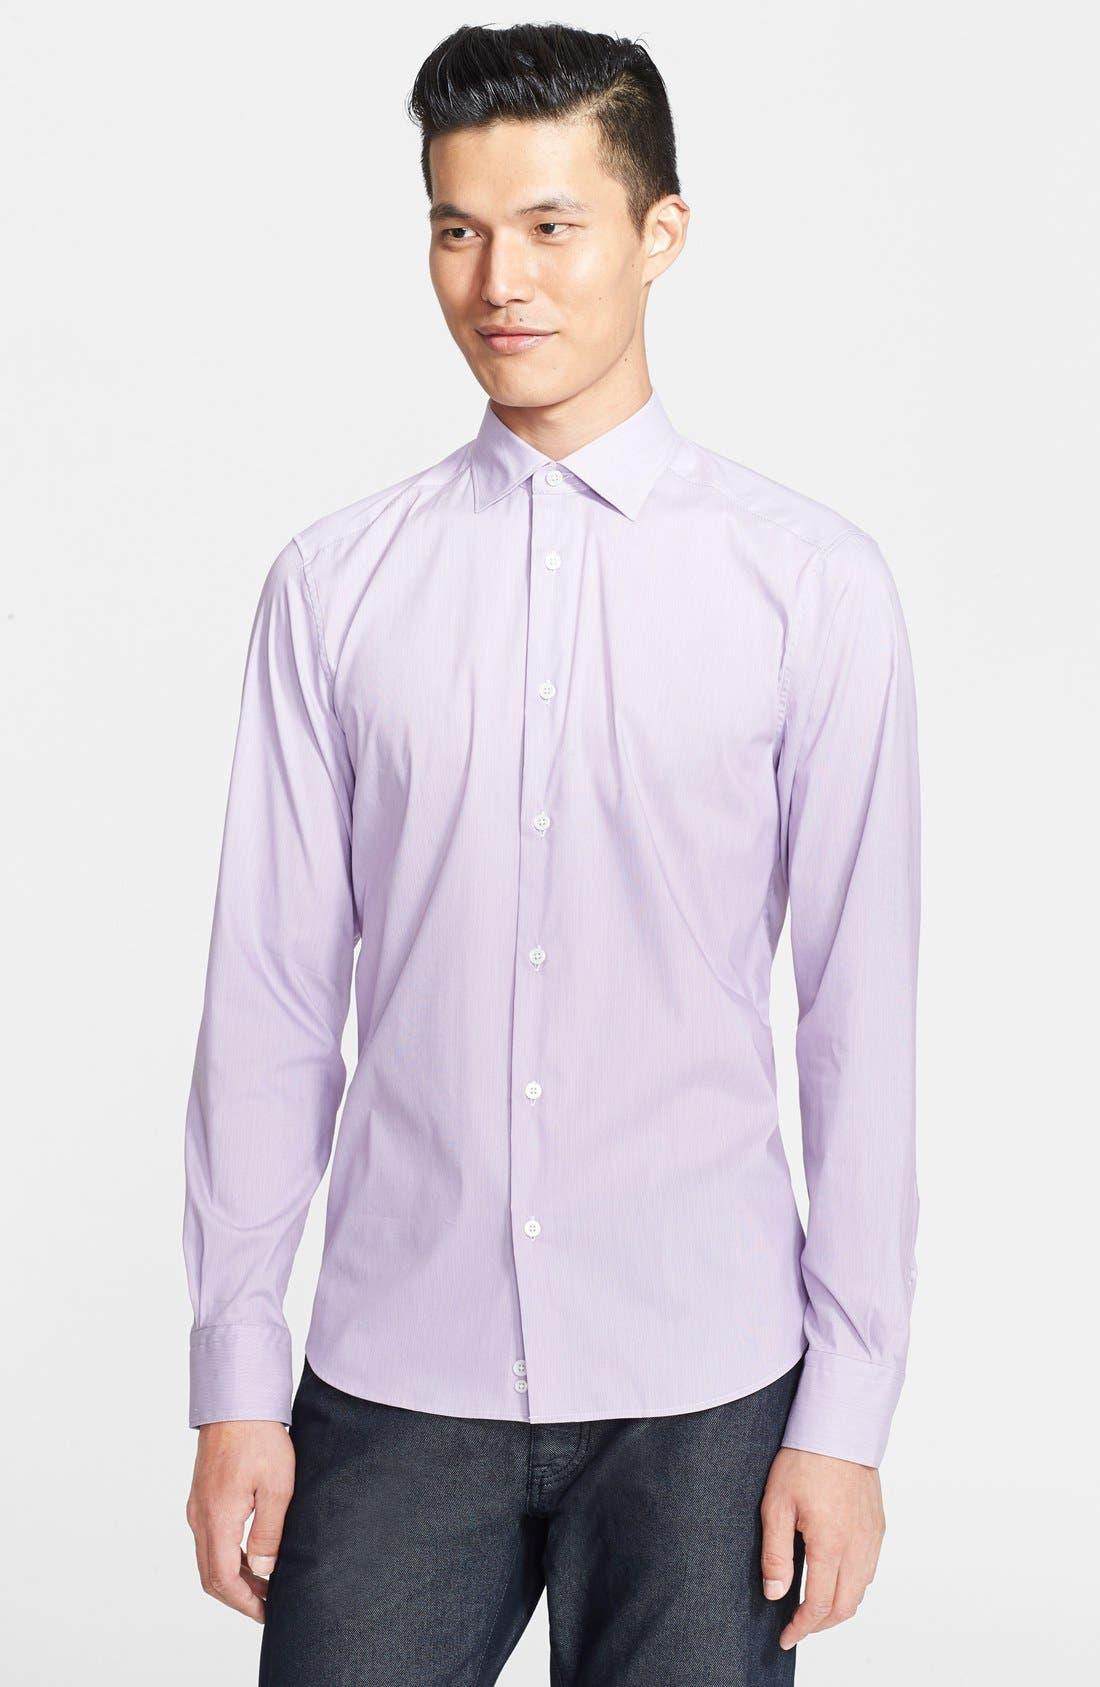 Alternate Image 1 Selected - Z Zegna Extra Trim Fit Stripe Dress Shirt